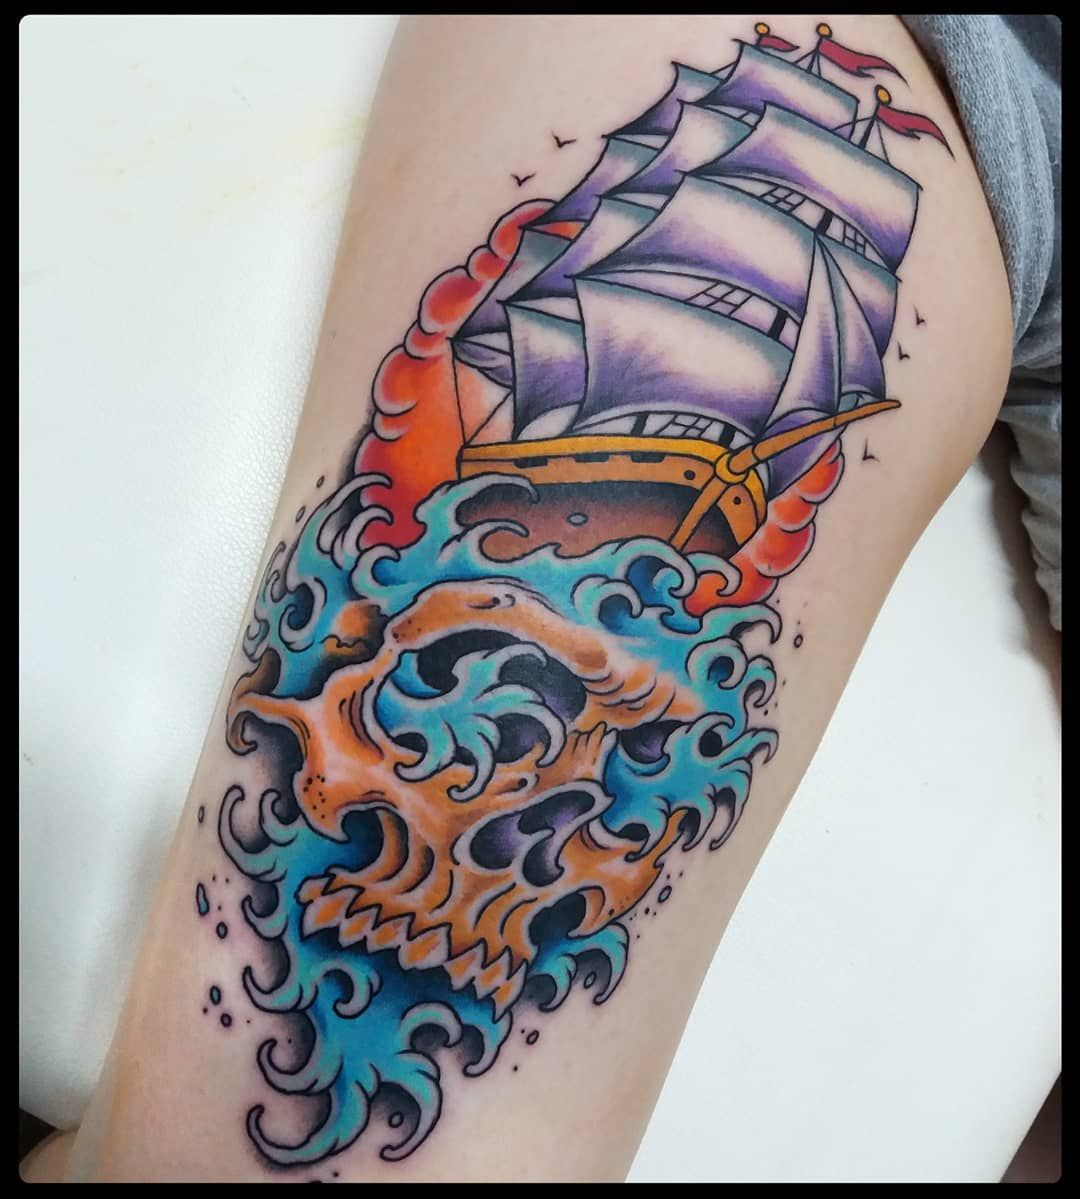 Pin Van Anne Hoekstra Op Hartenvrouw Tattoos Tattoo Designs En